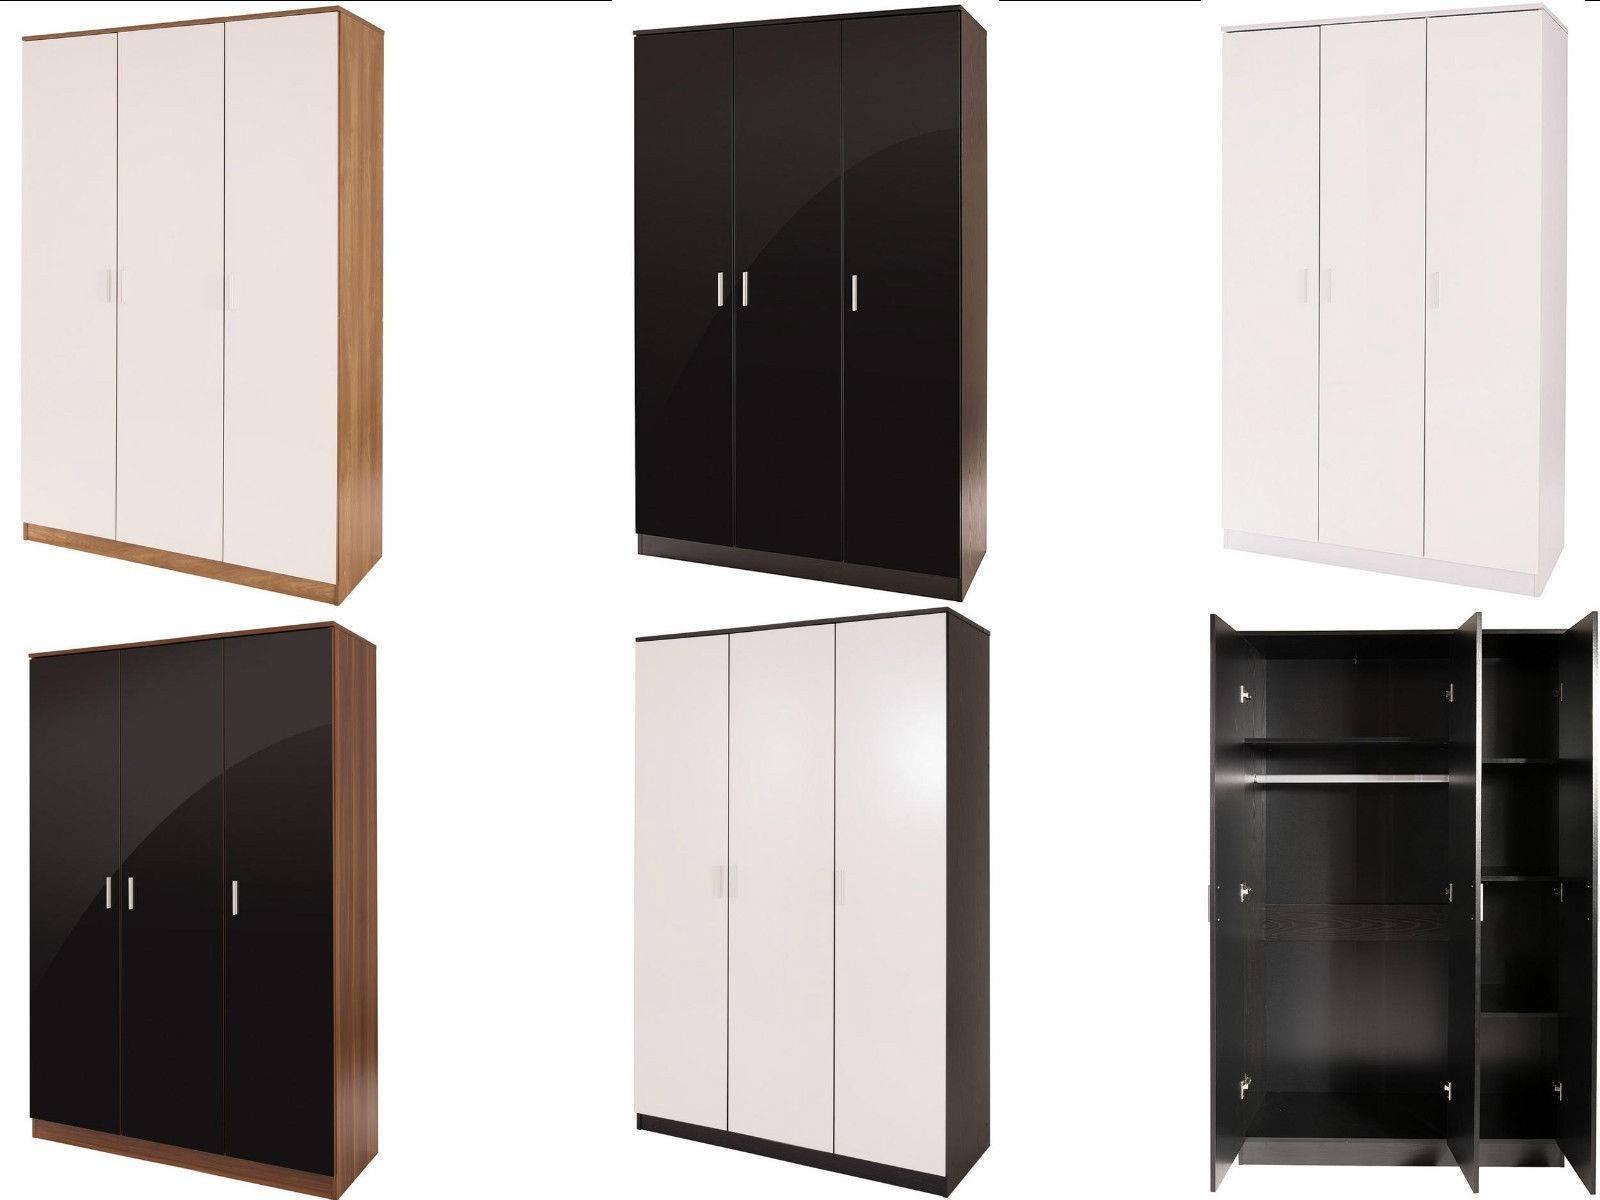 Caspian Supreme High Gloss 3 Door Wardrobes With Shelves Black Oak throughout Black Gloss 3 Door Wardrobes (Image 4 of 15)